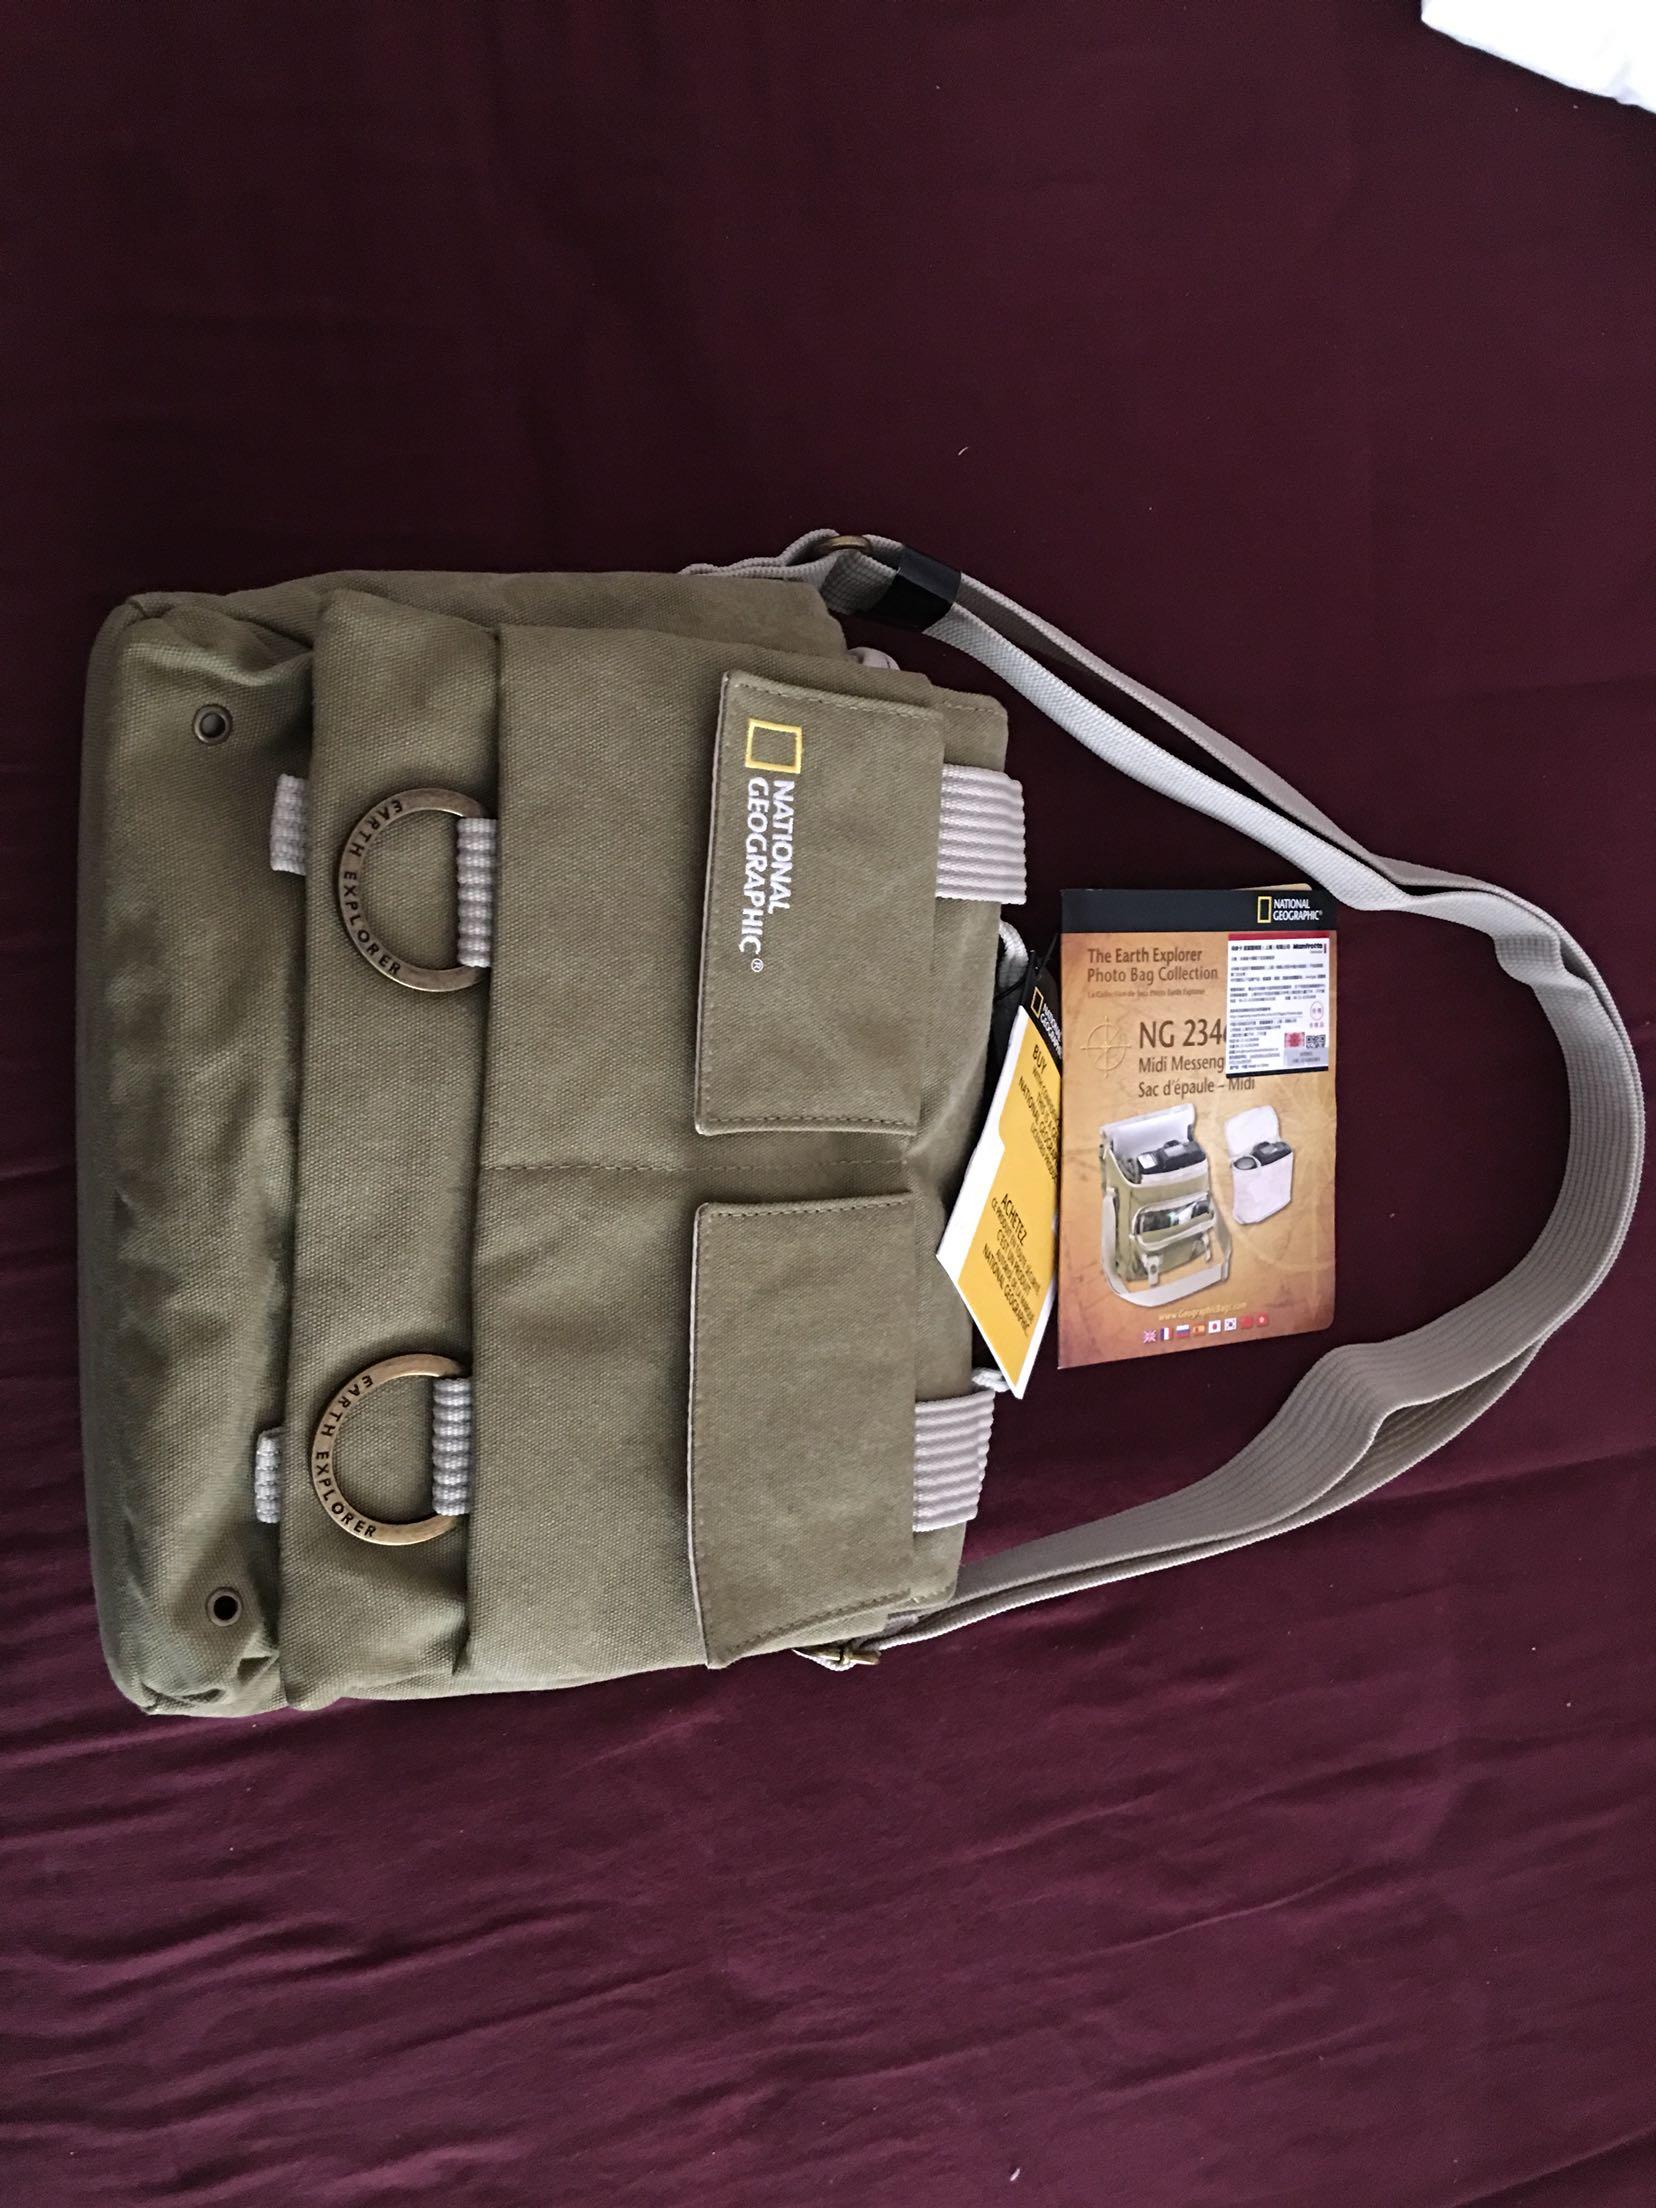 buy handbags online 00250119 clearance